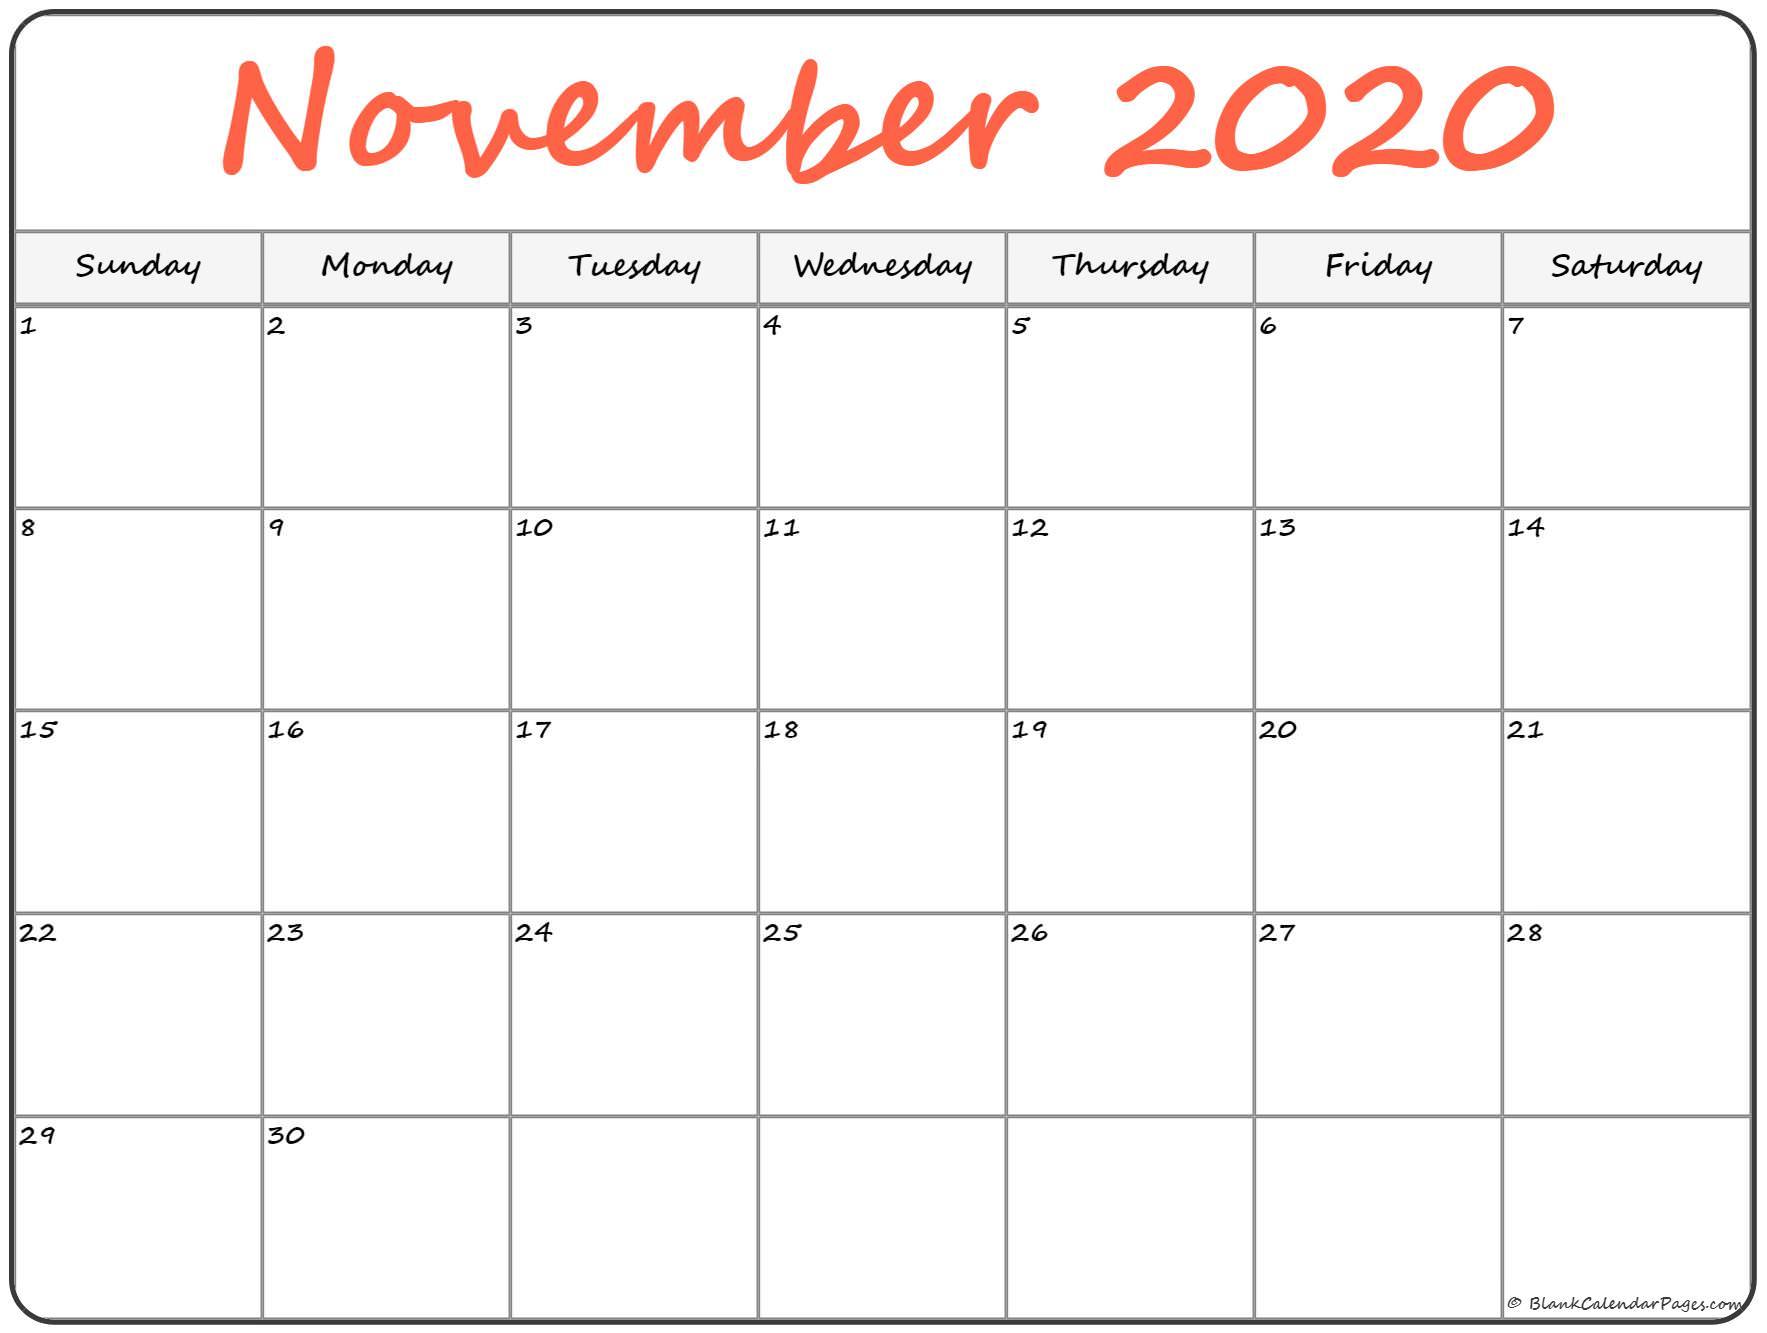 November 2020 Calendar | Free Printable Monthly Calendars